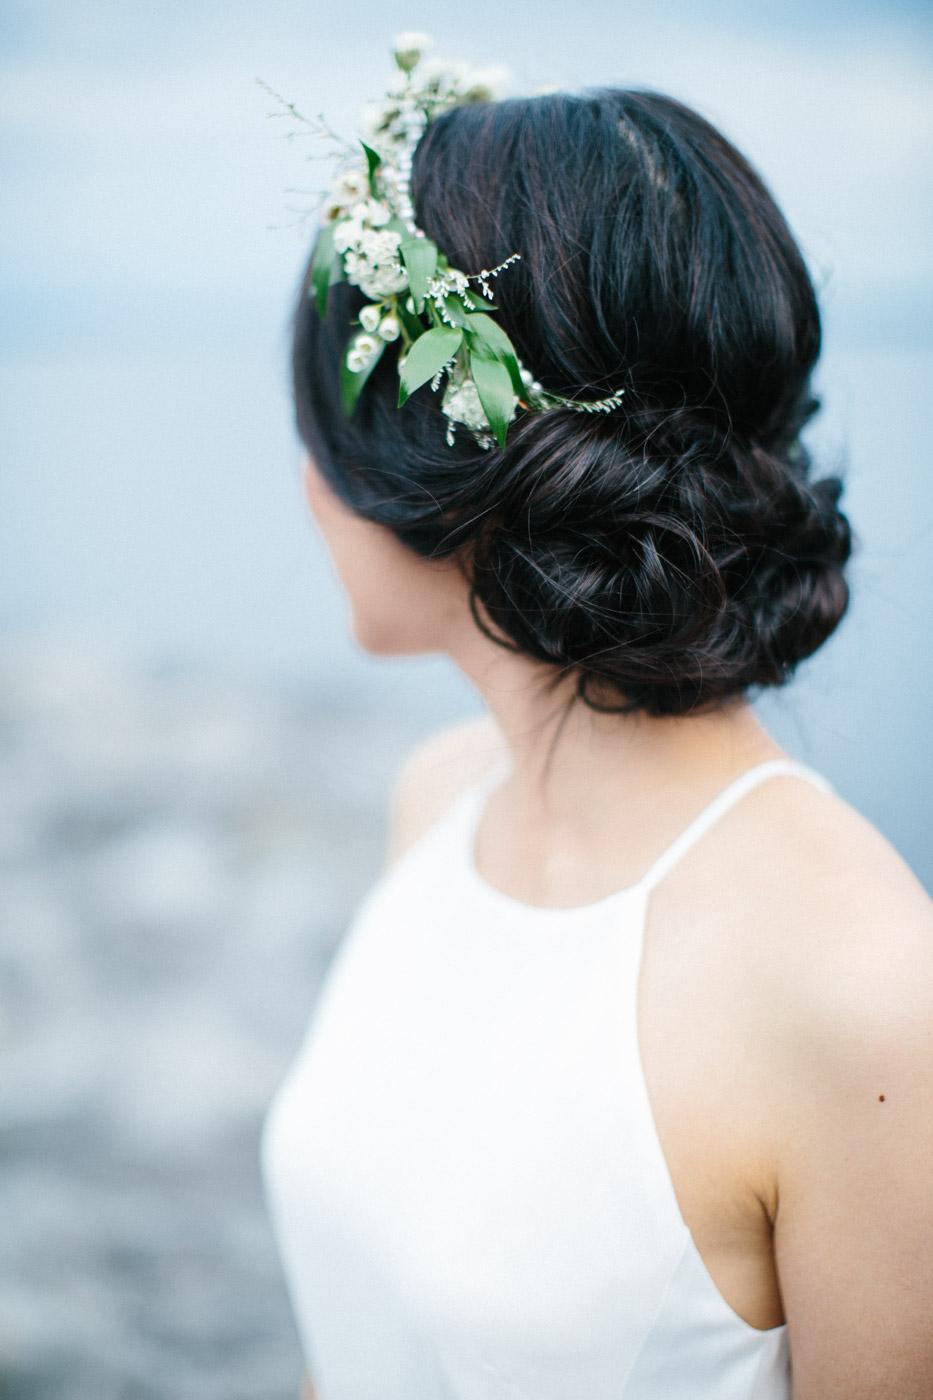 toronto_wedding_photographer_fine_art_documentary 2017-186.jpg